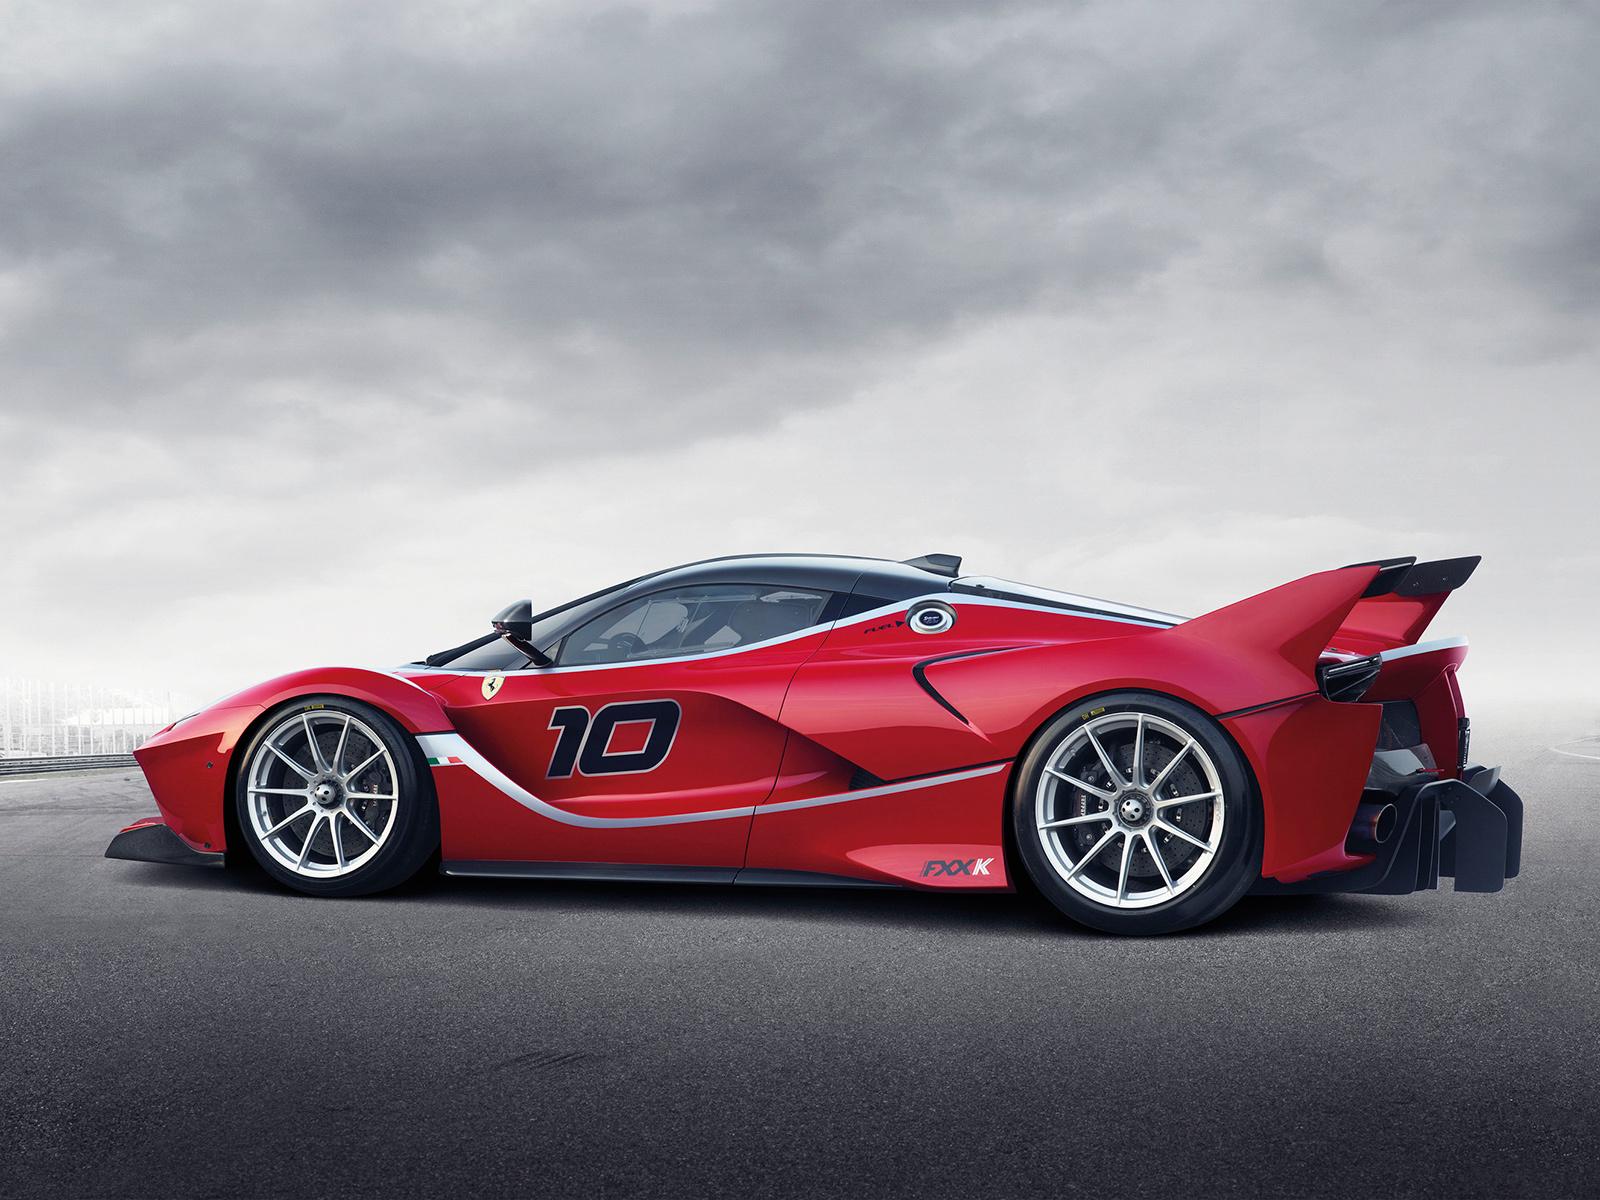 Ferrari Spider HD wallpapers free download